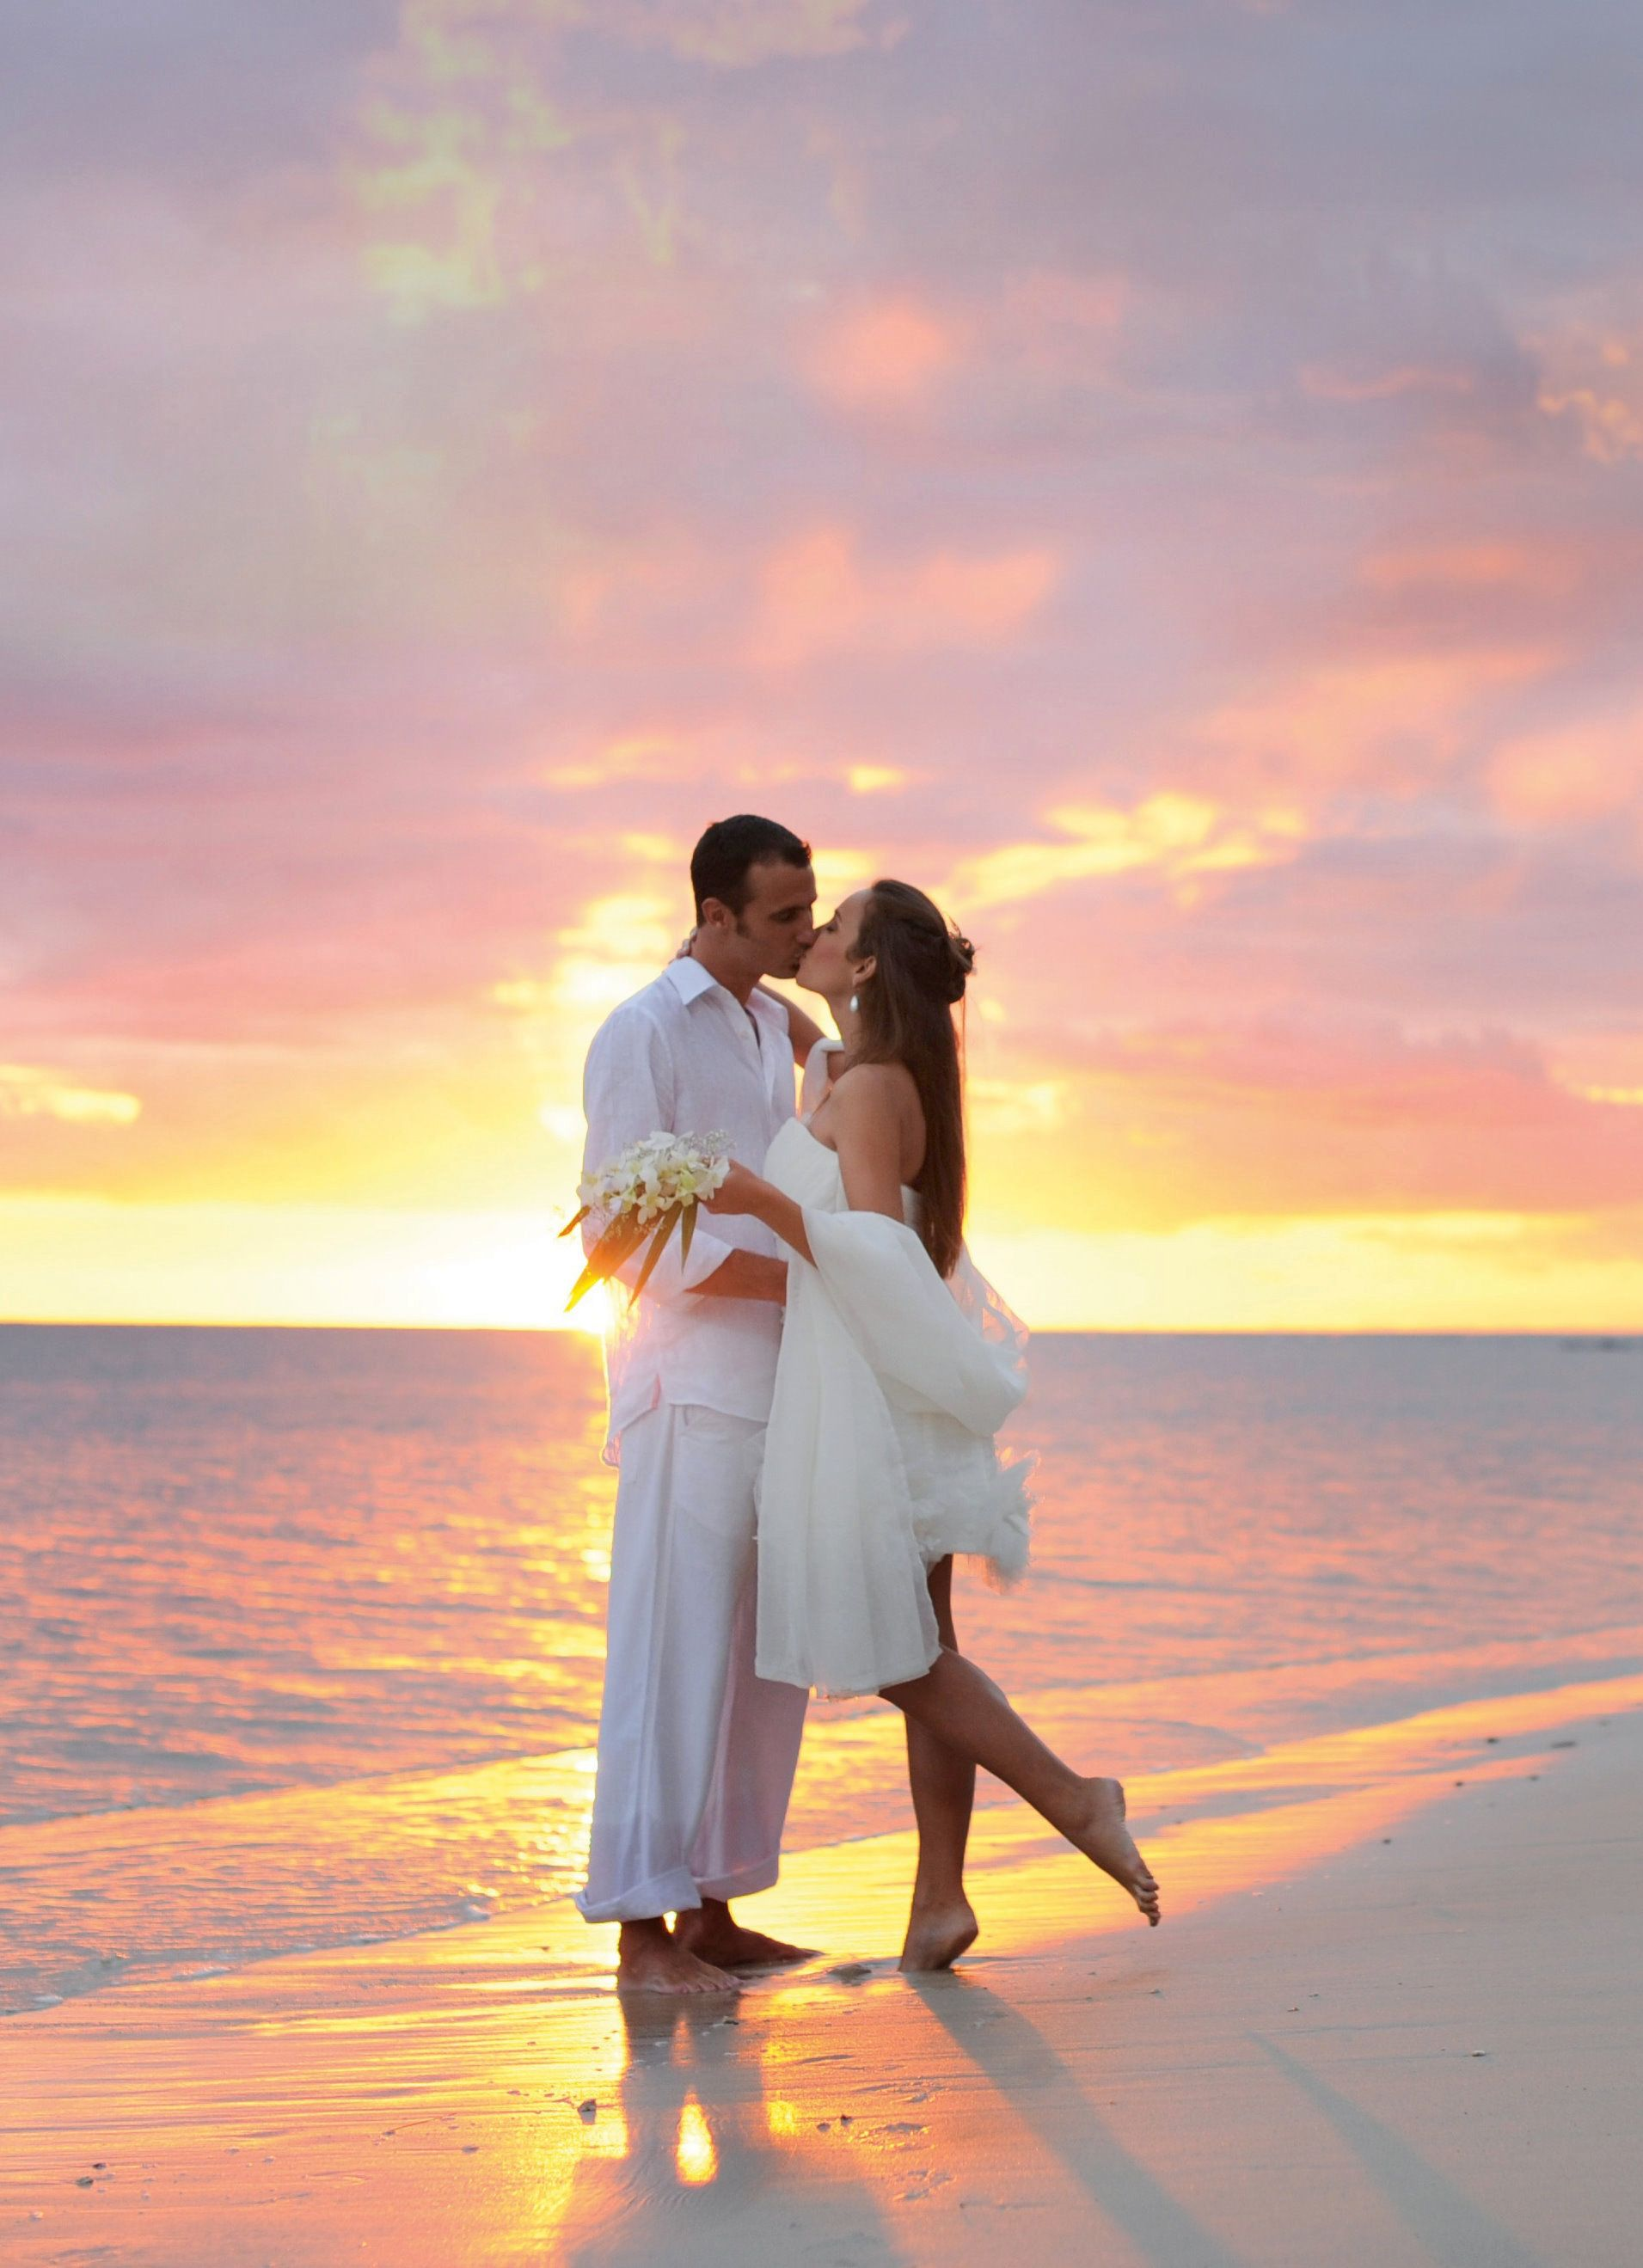 Why Should You Go For A Destination Wedding?